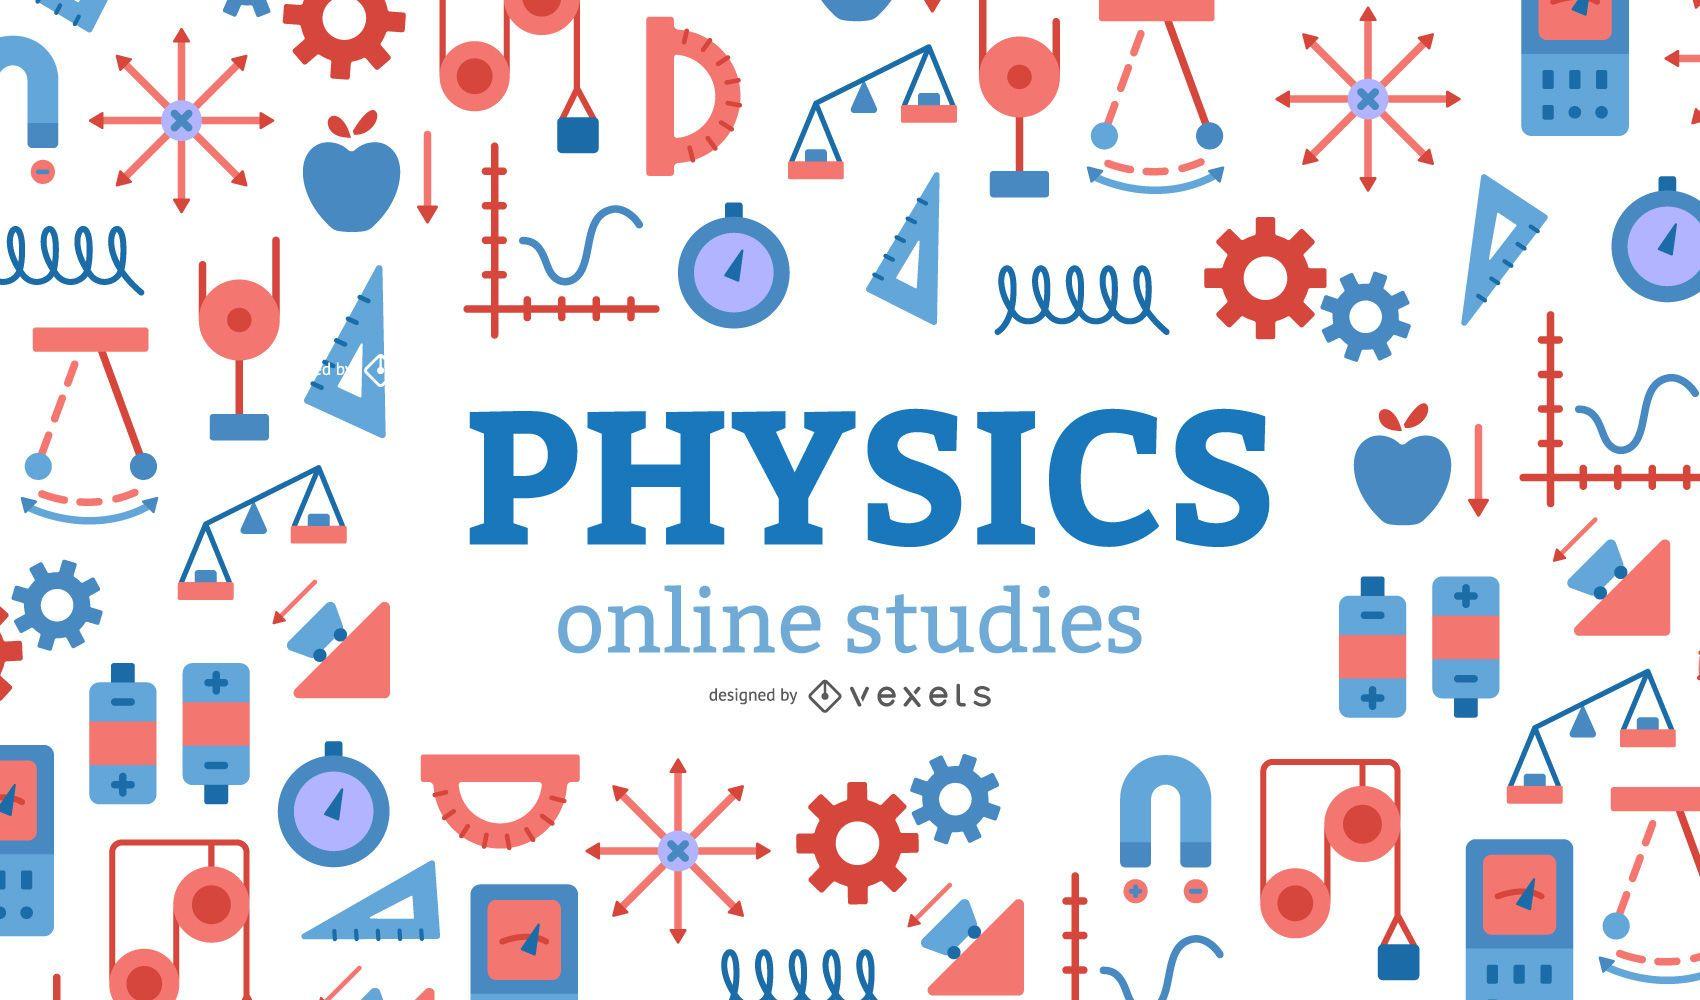 Physics Online Studies Cover Design